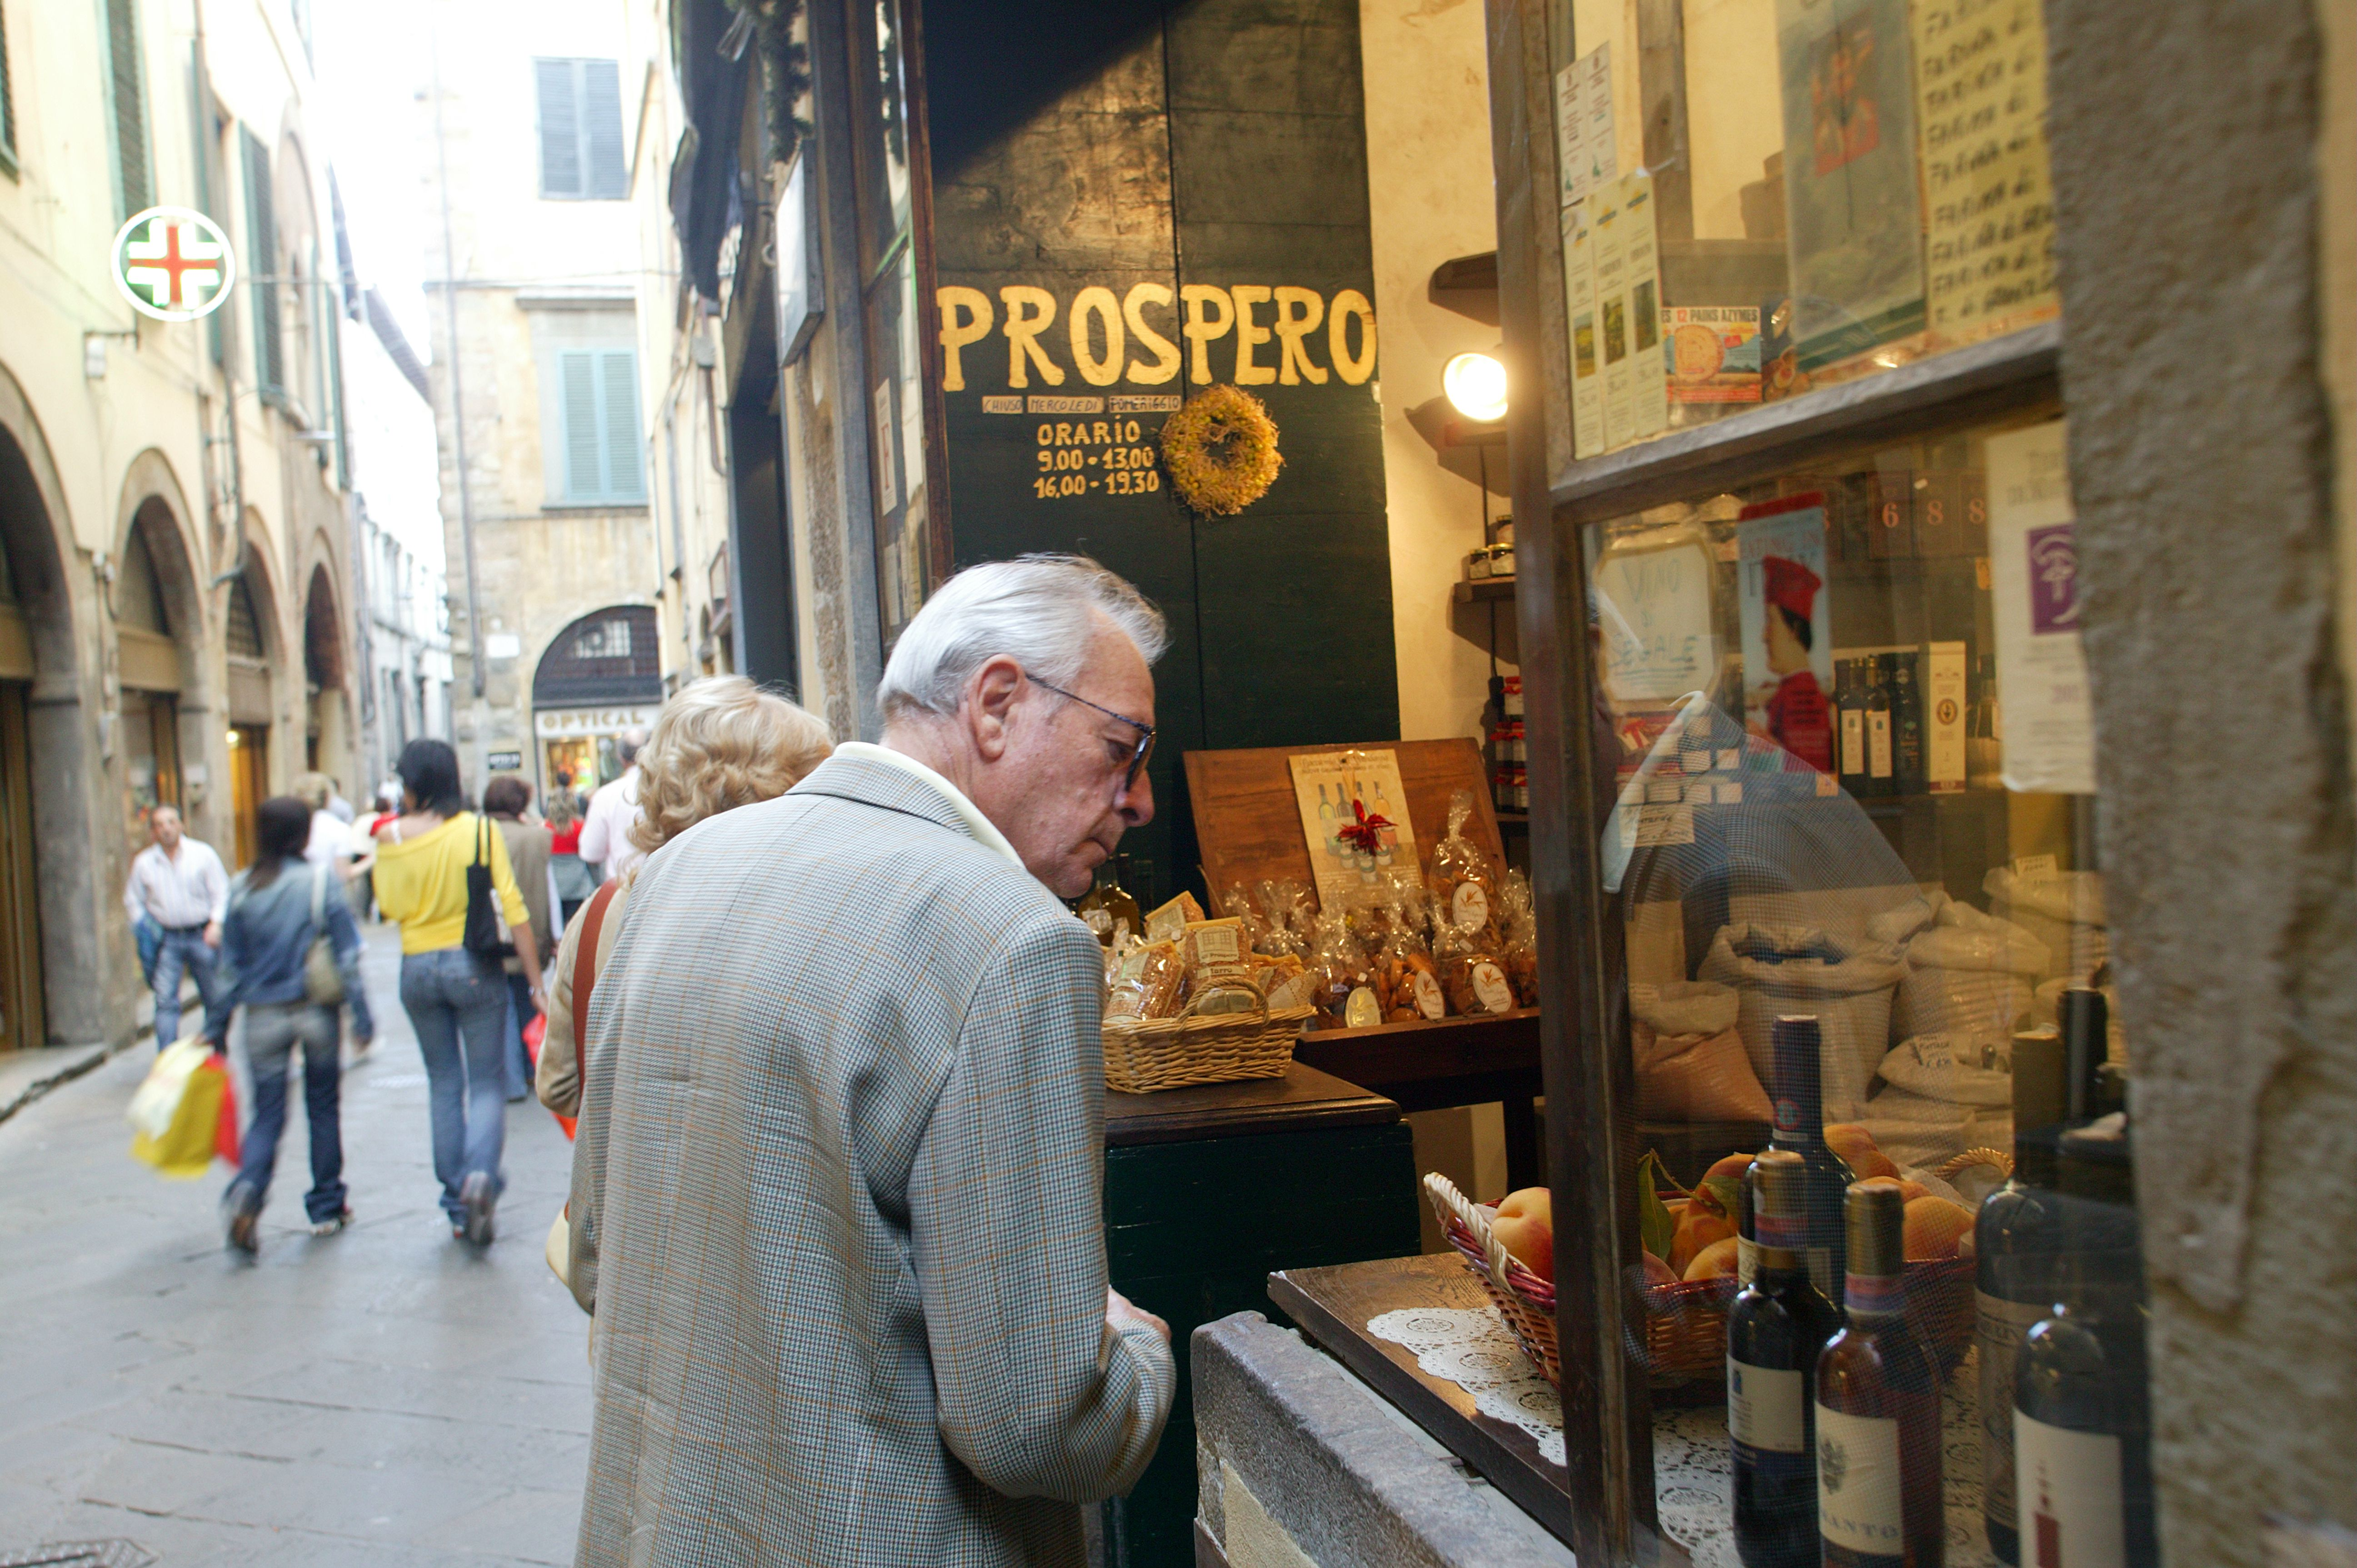 Window Shoppers Admiring Food